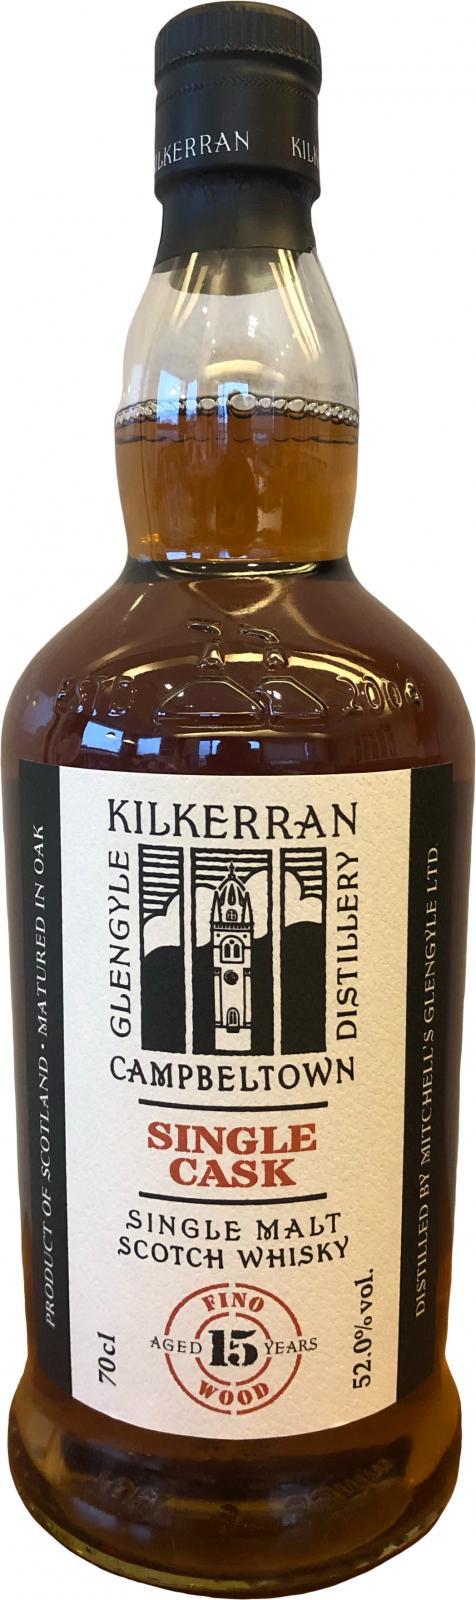 Kilkerran 15-year-old